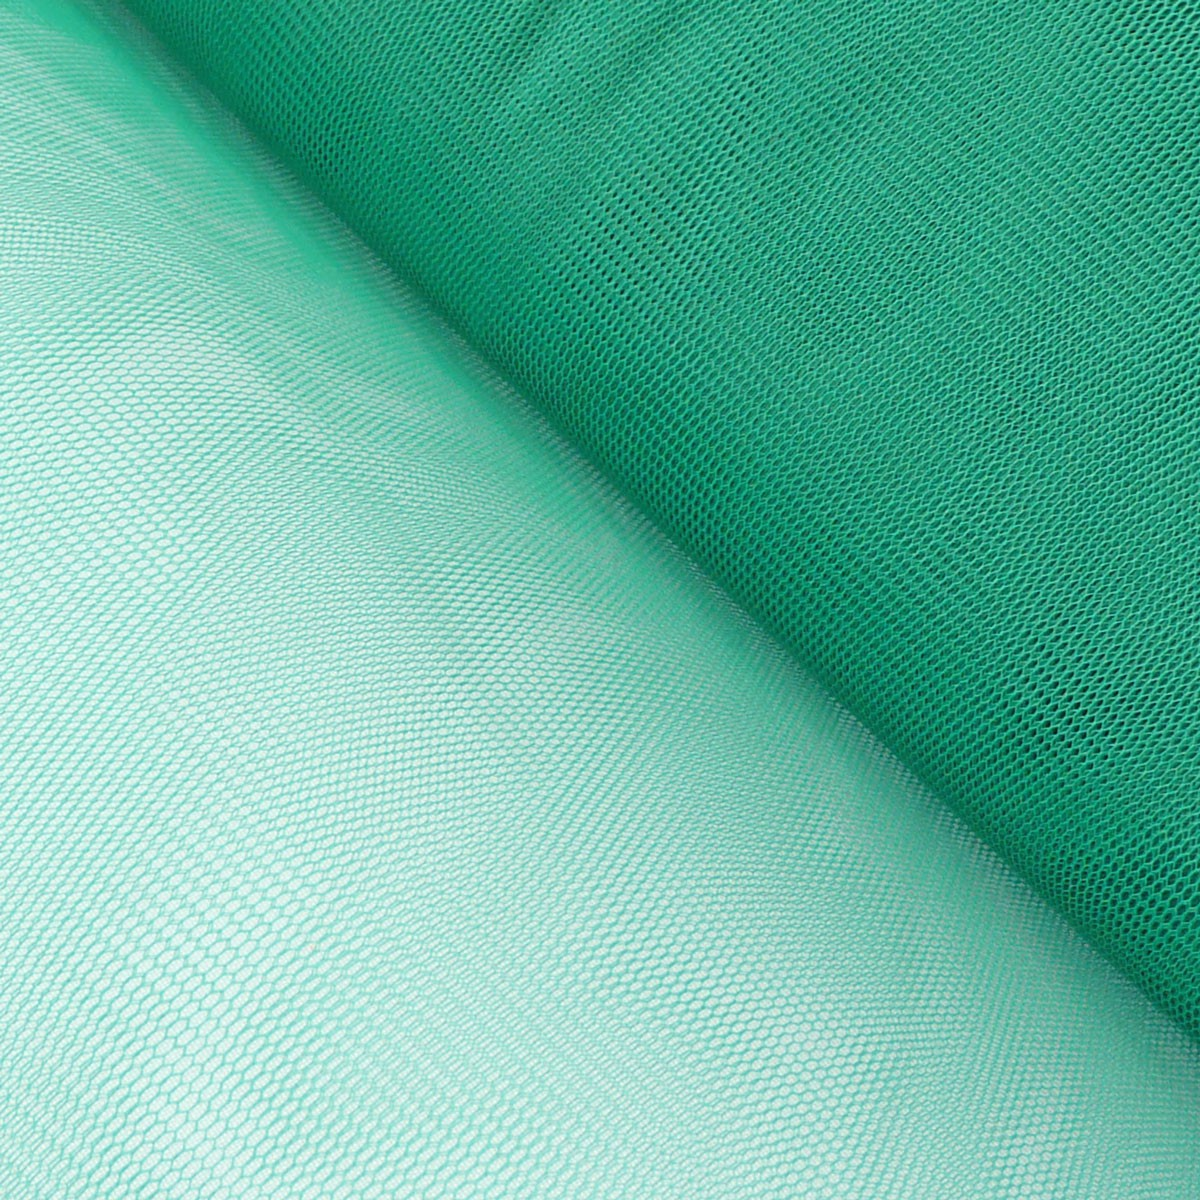 Kreativstoff Tüll Polyester dunkelgrün 1,4m Breite